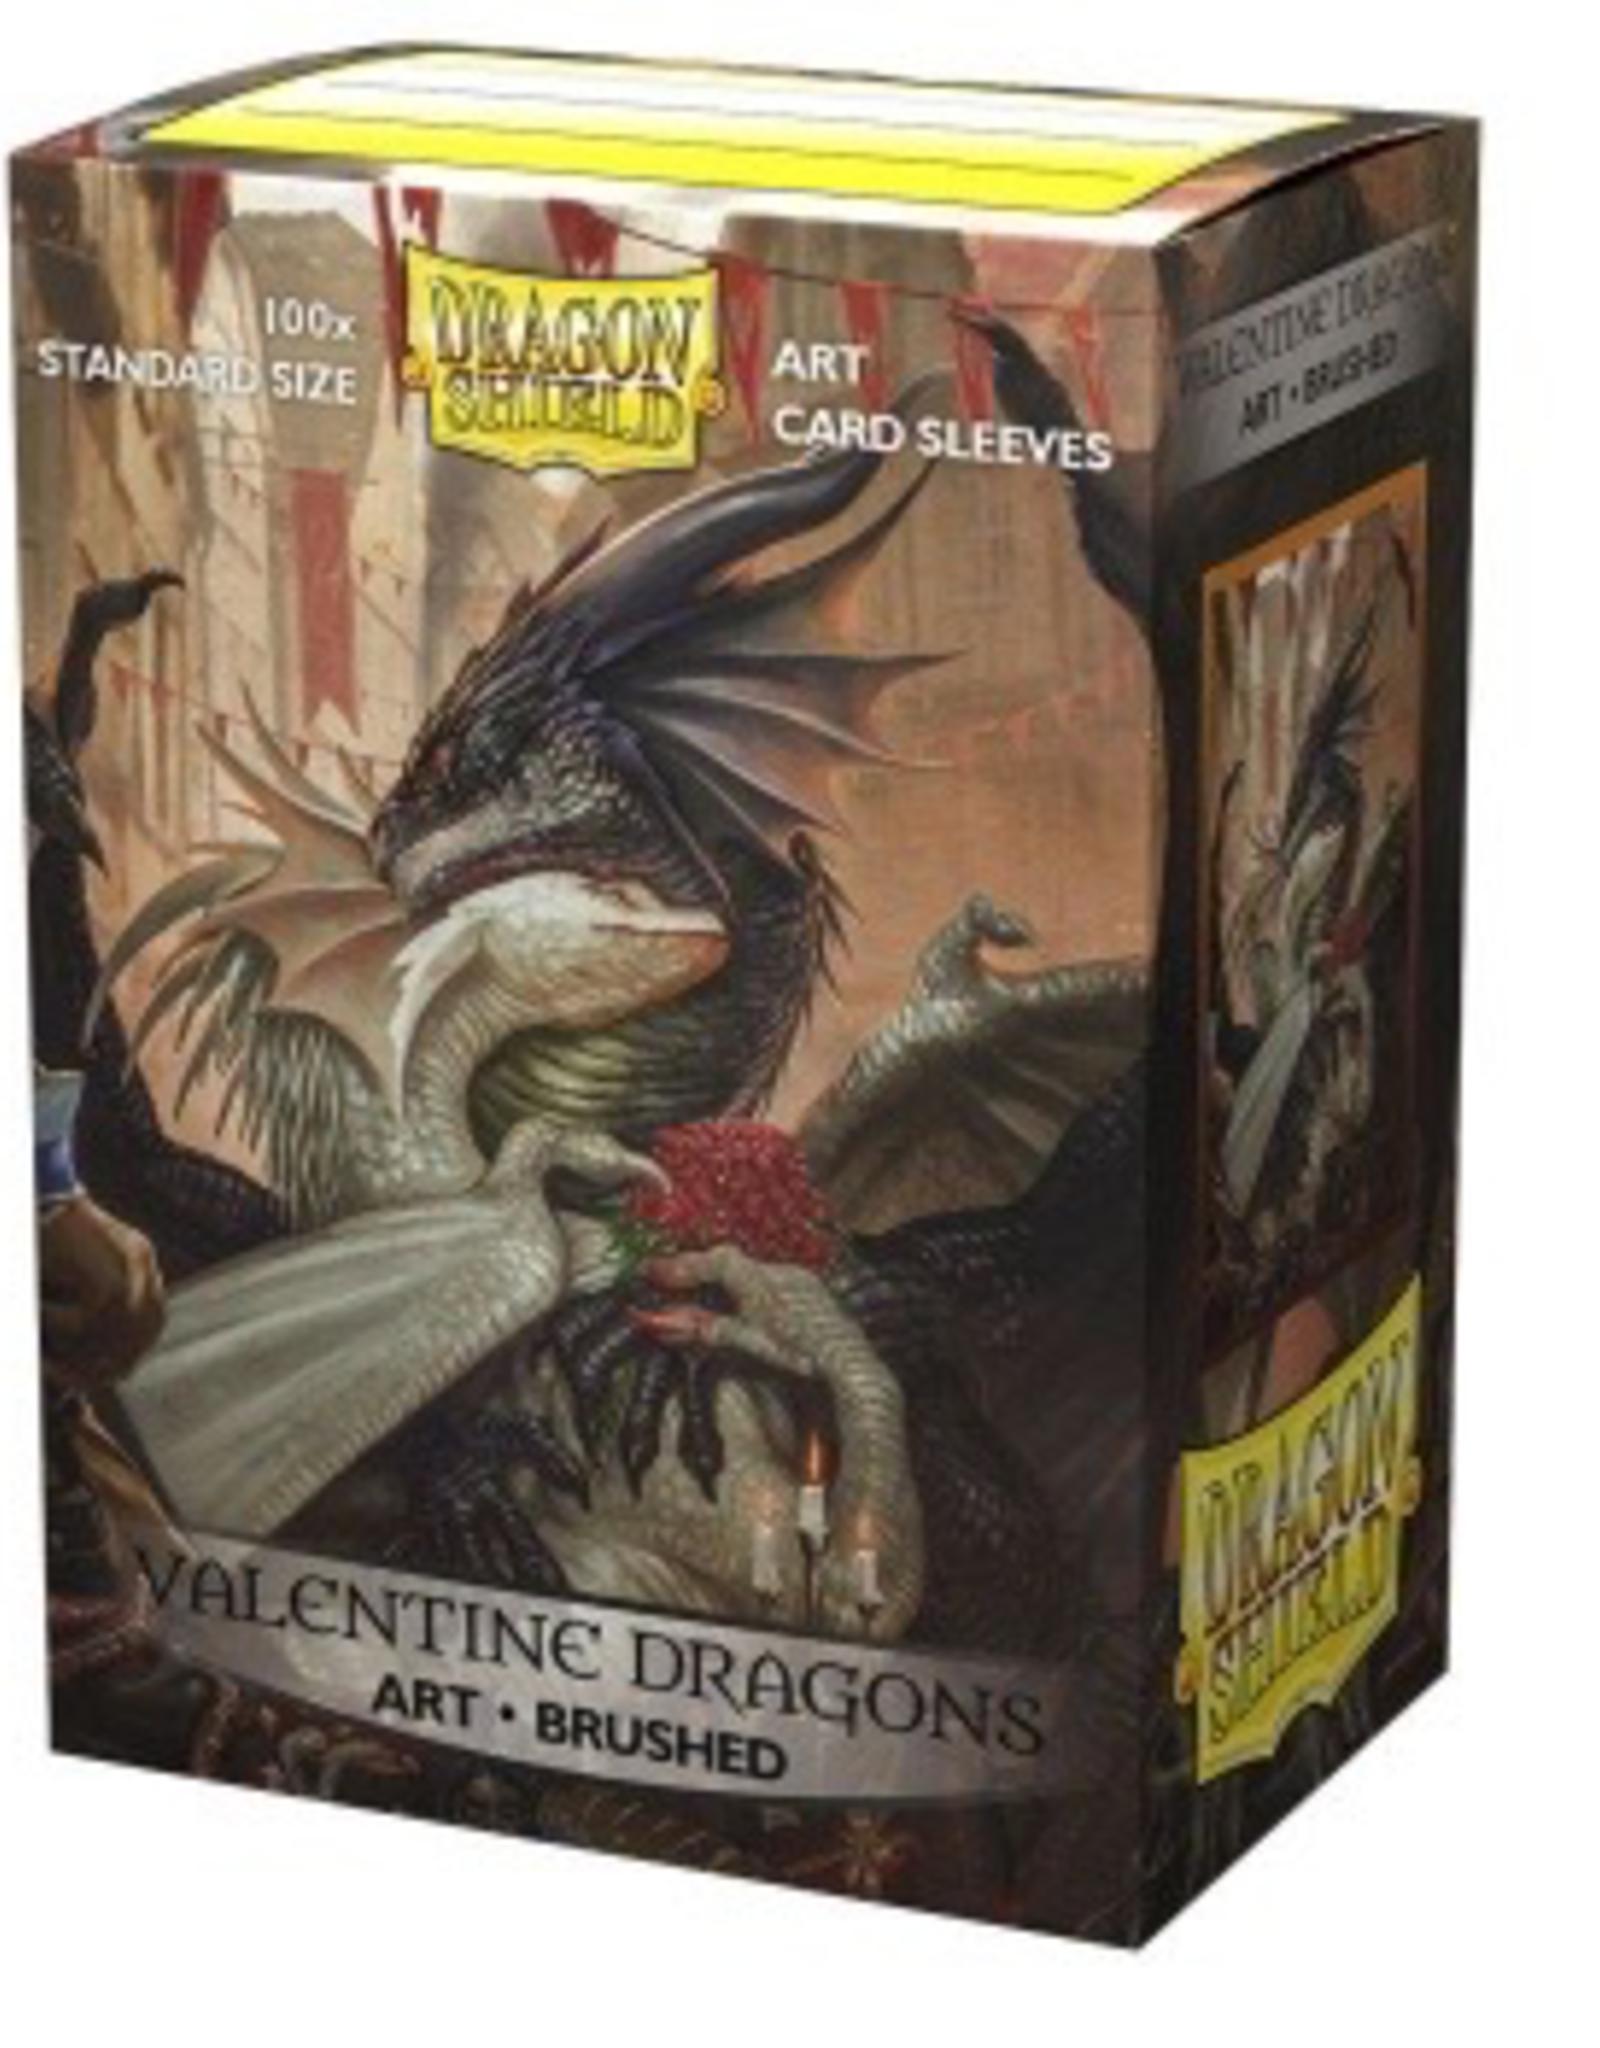 DS - Standard Sleeves Dragon Shield Brushed Art Sleeves - Valentine Dragon 2021 (100 Sleeves)